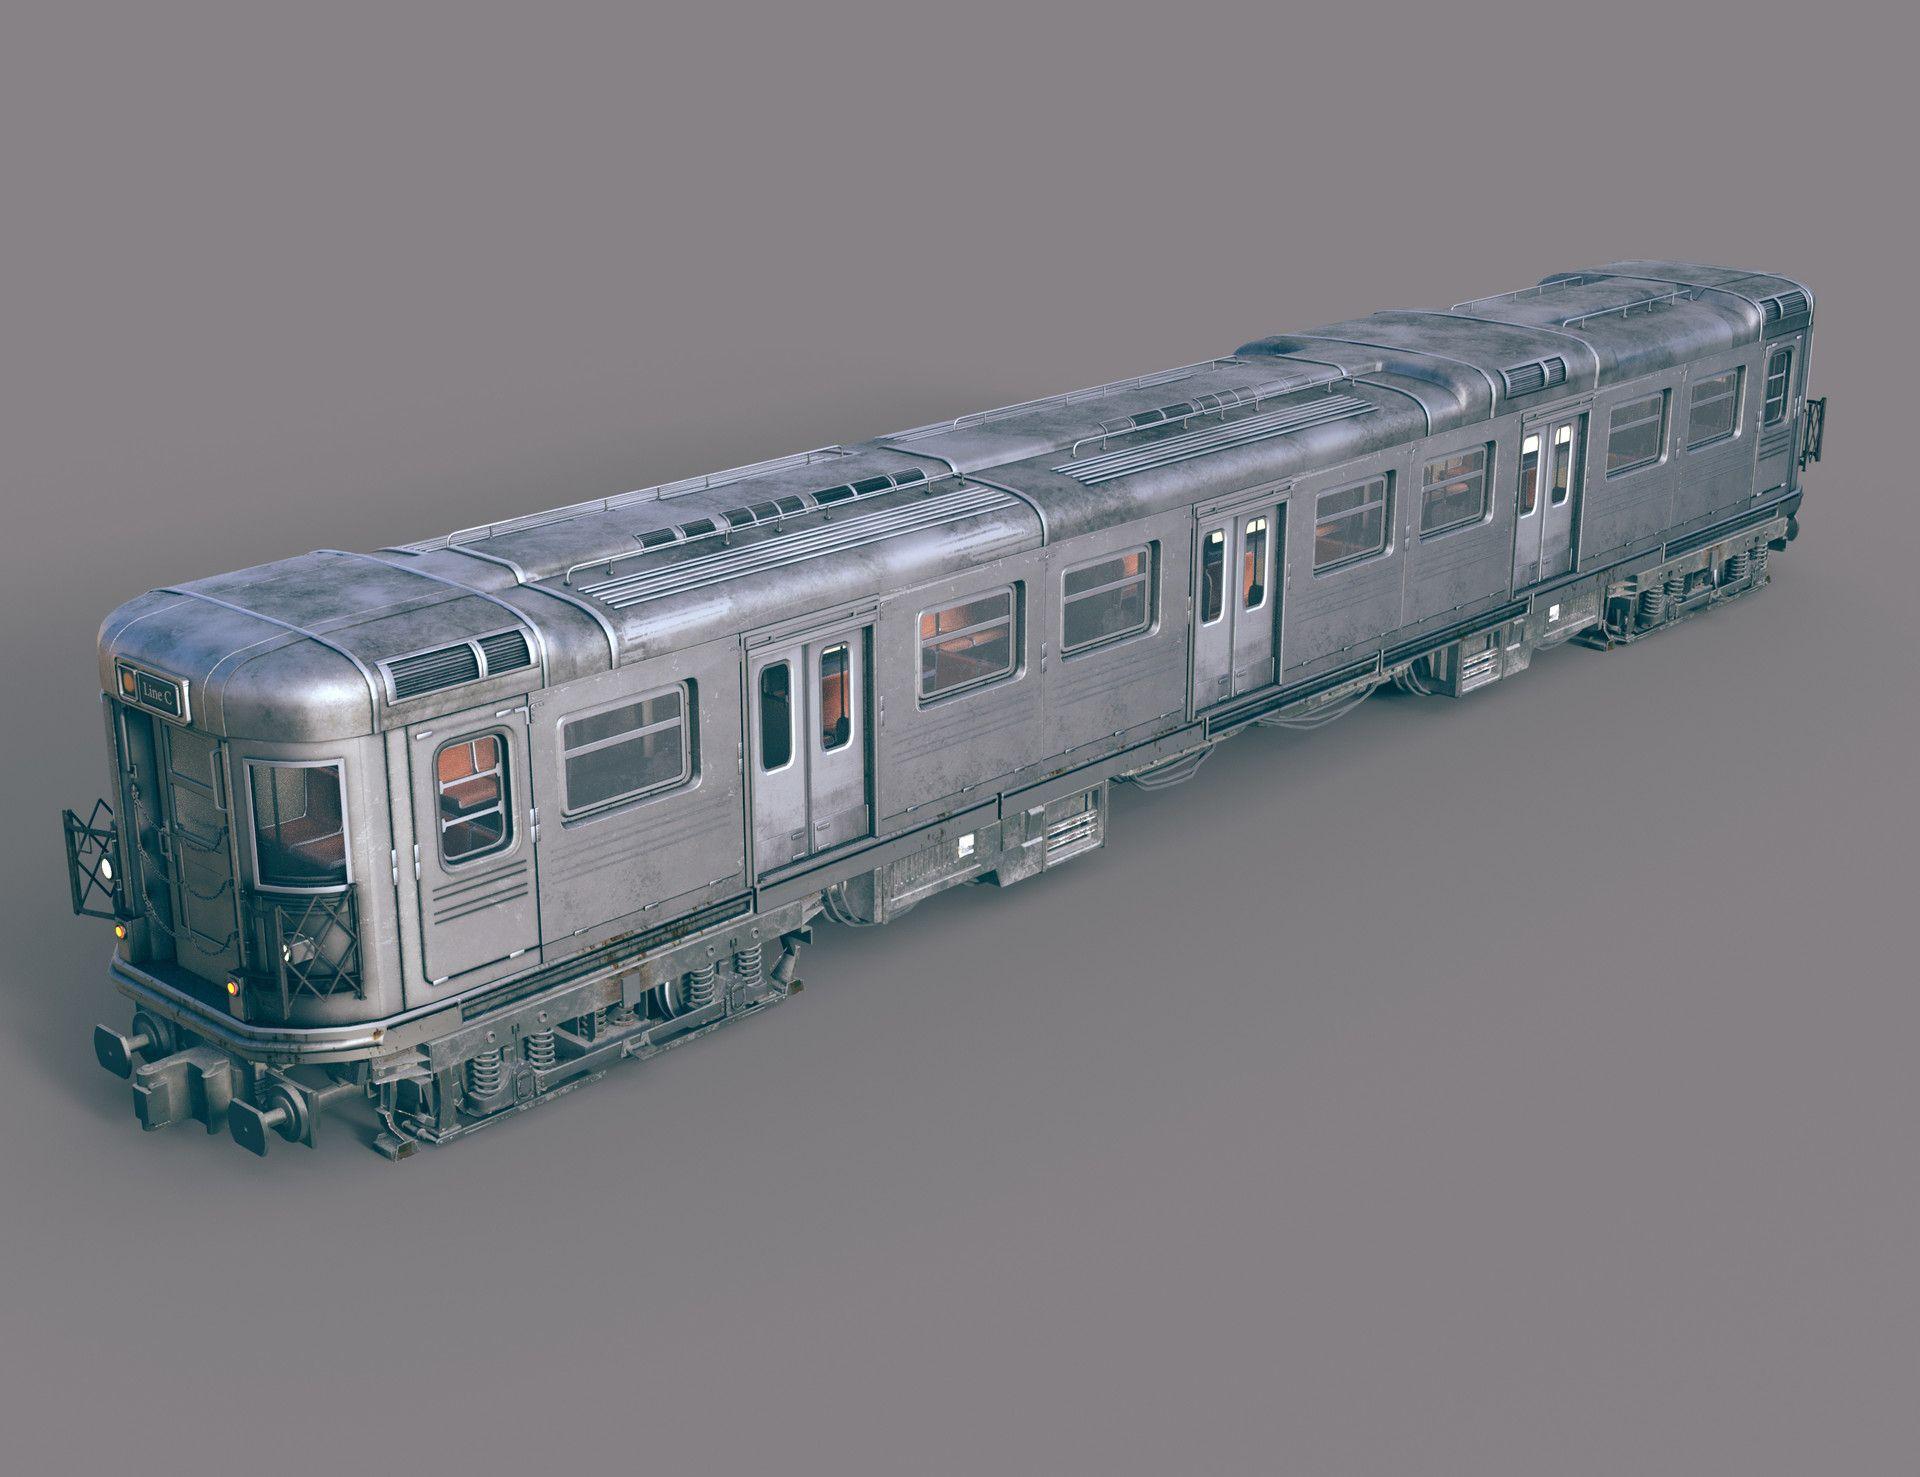 ArtStation - Subway train, Misuo WU